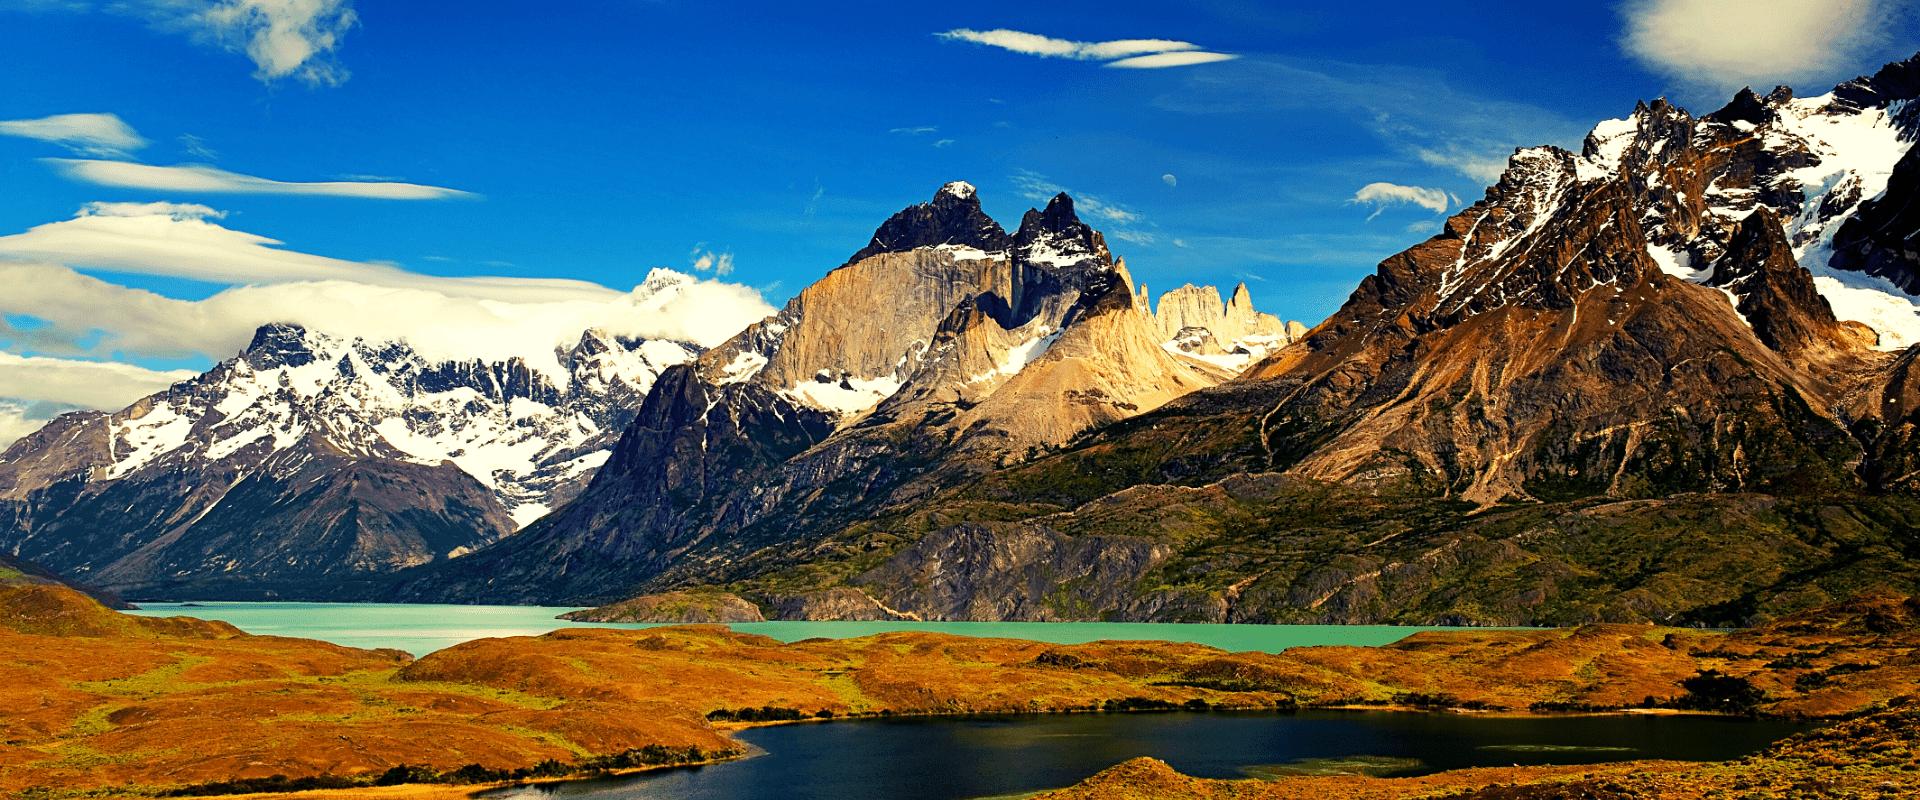 Argentina Chile Duo Adventure, Chile